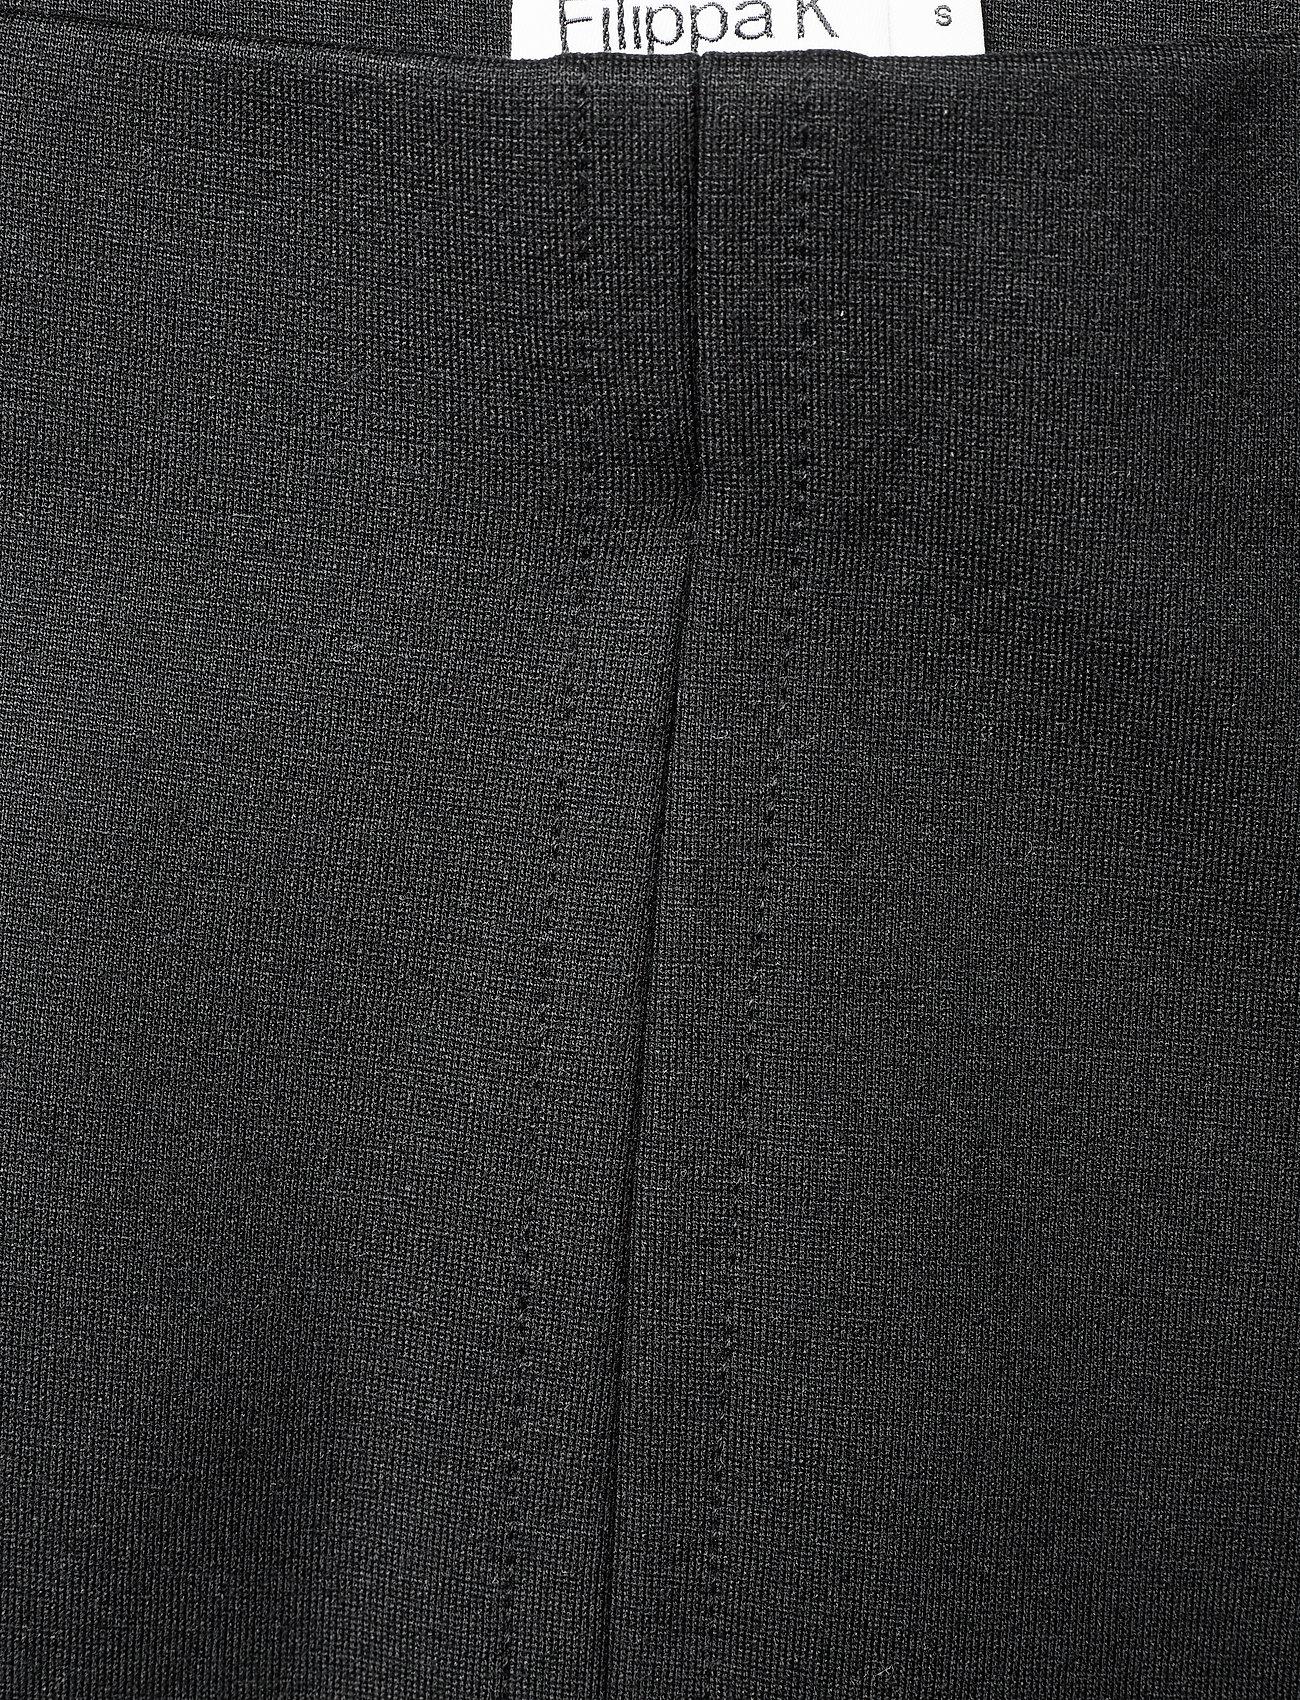 Filippa K Eva Pull-on Skirt - Spódnice BLACK - Kobiety Odzież.